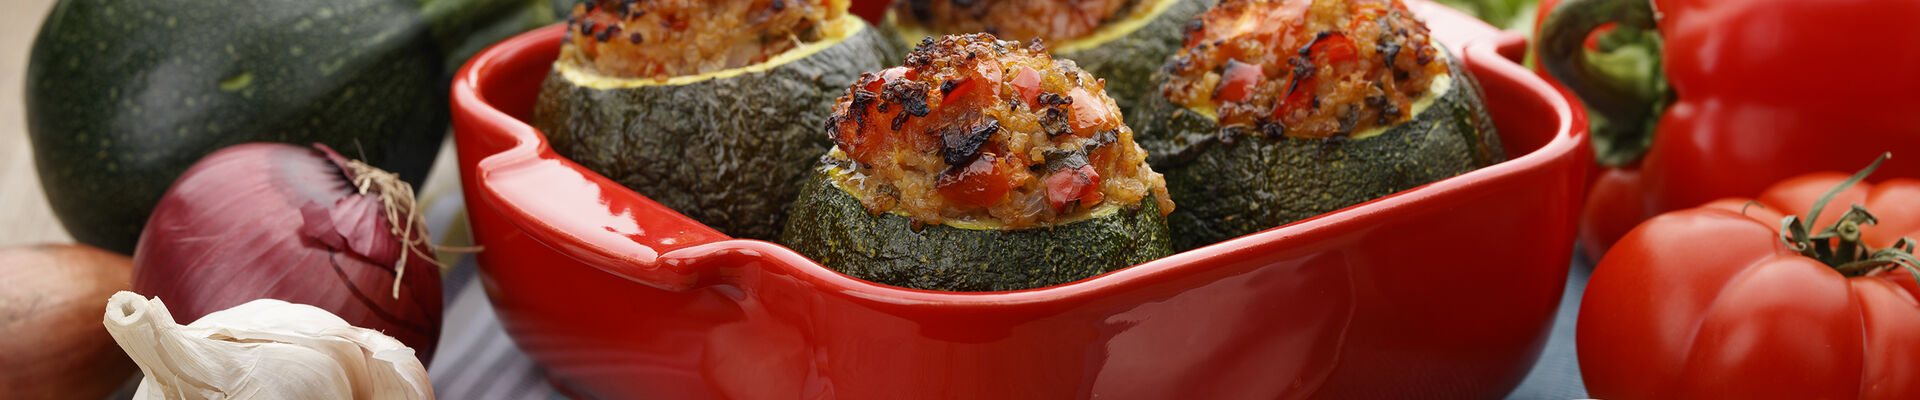 Courgettes farcies au quinoa